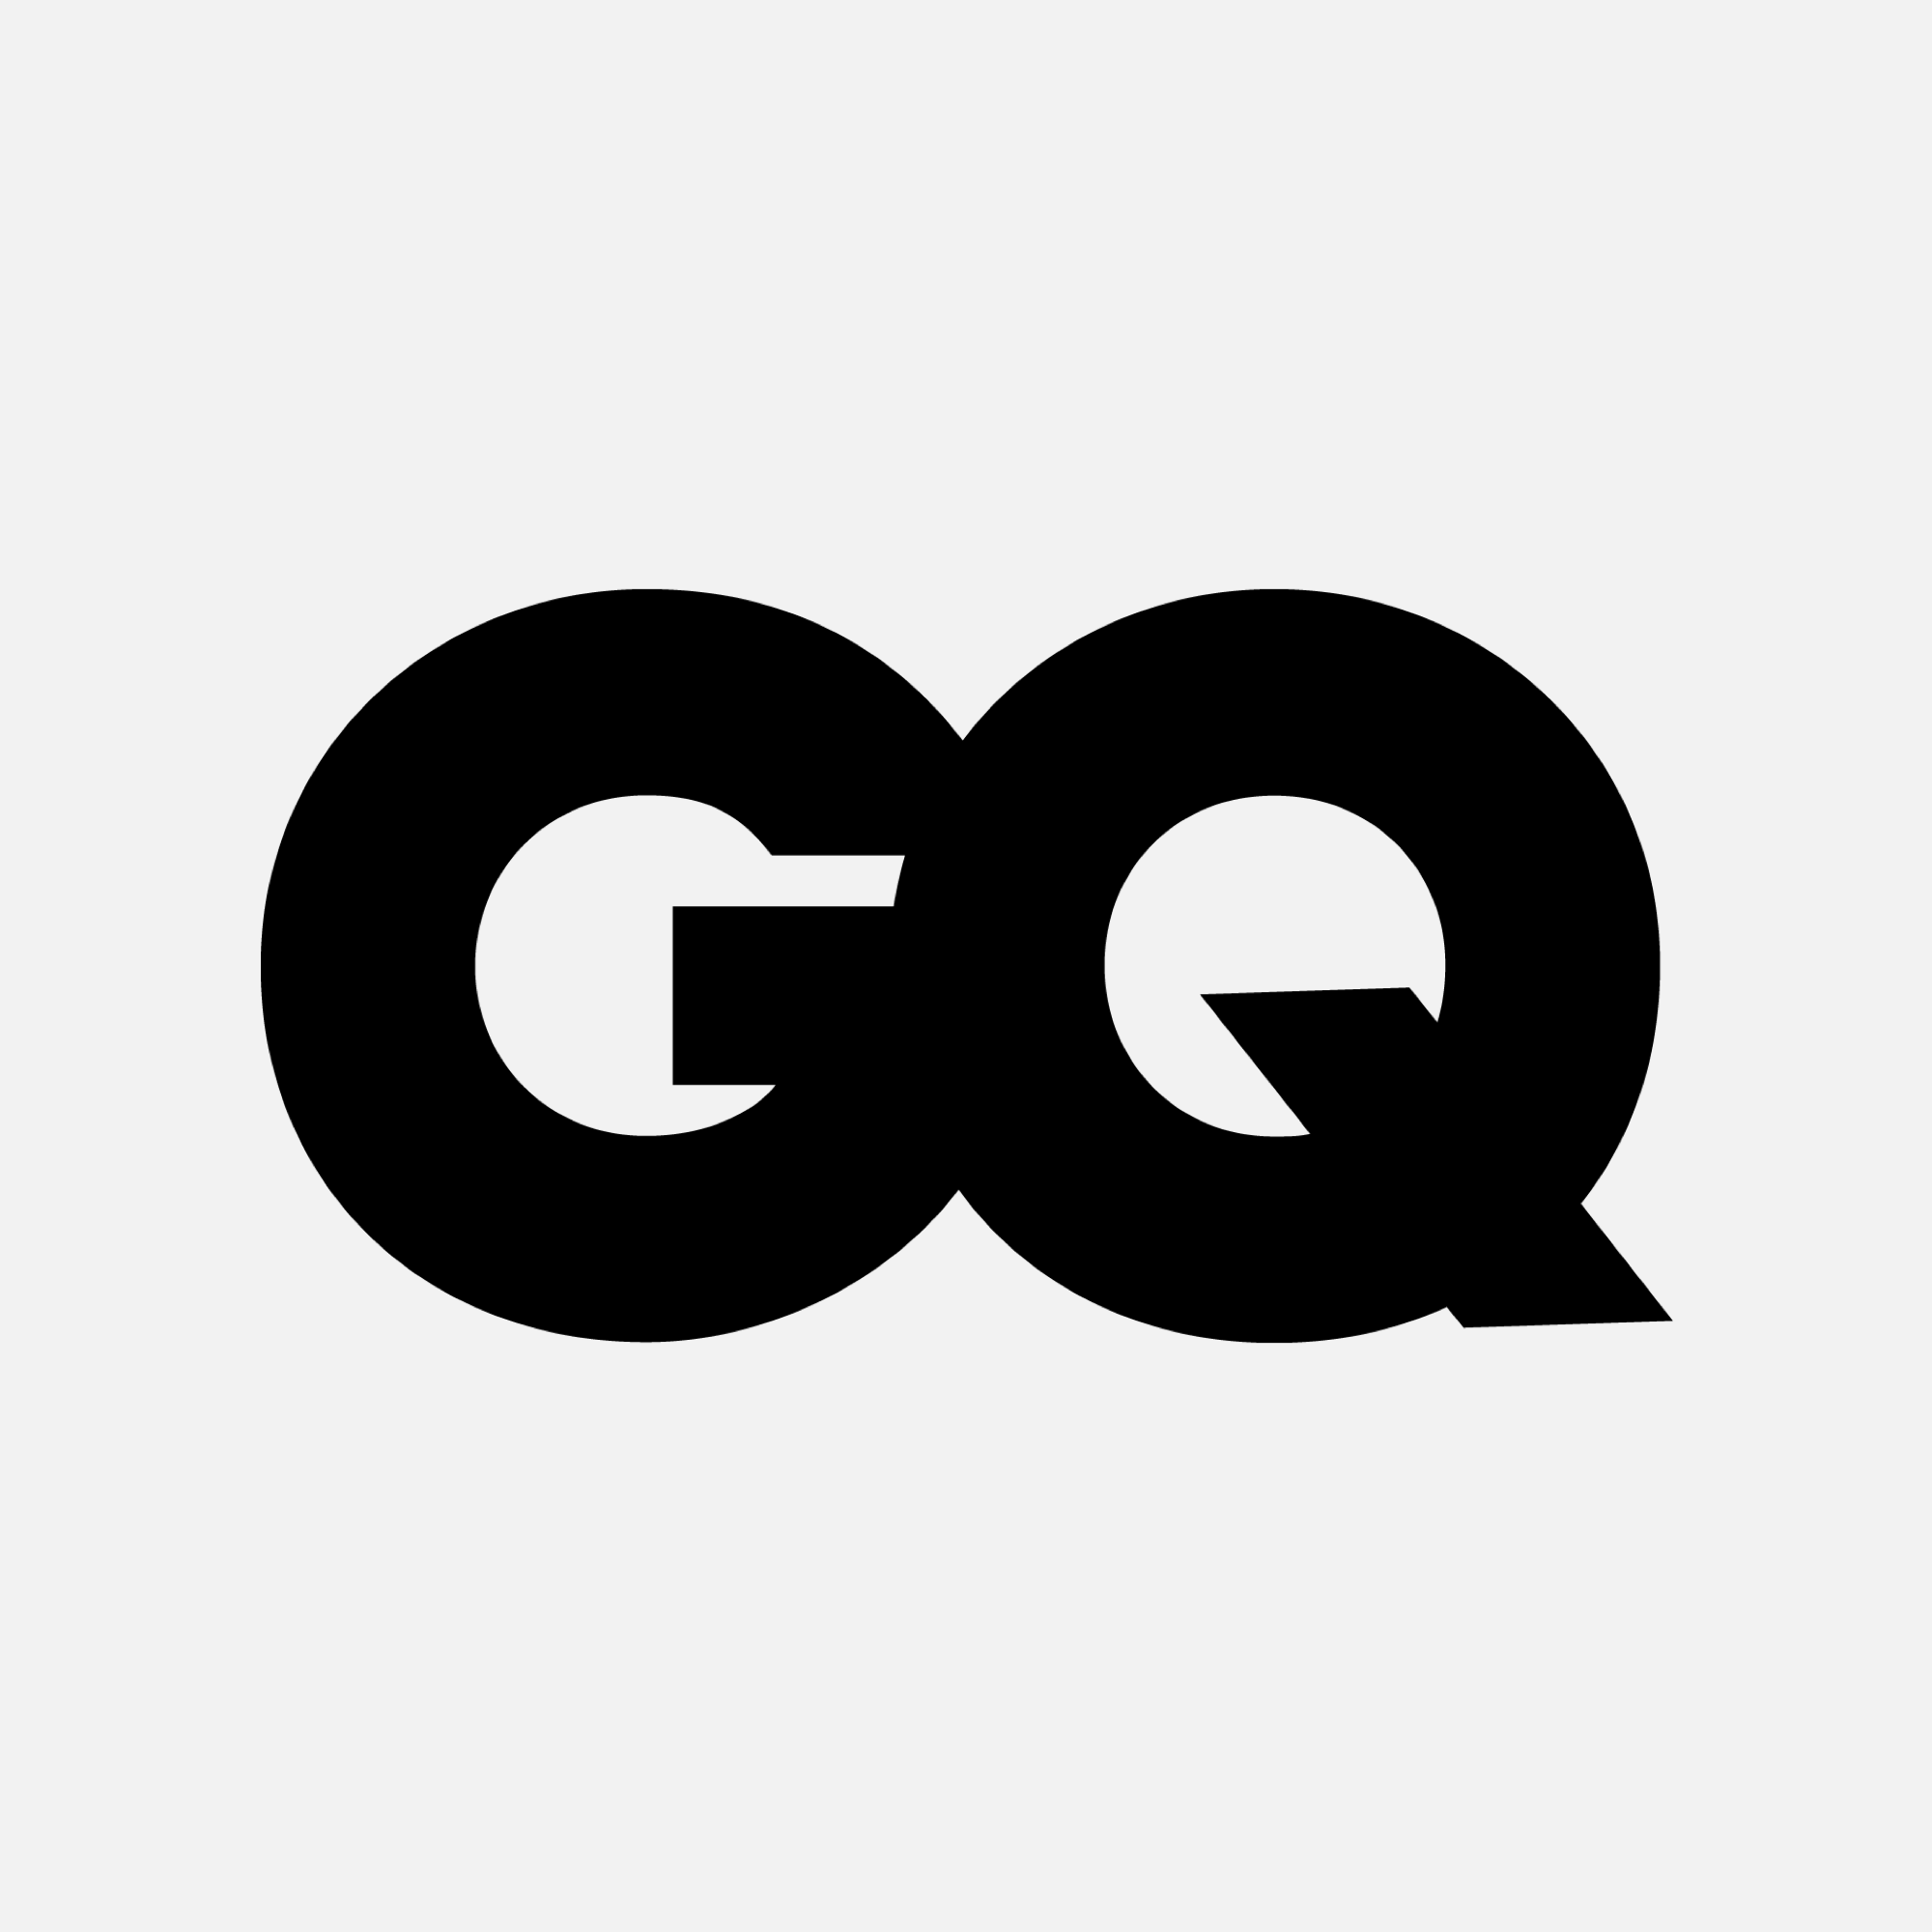 GQ-logo.png?f=center&fit=fill&q=88